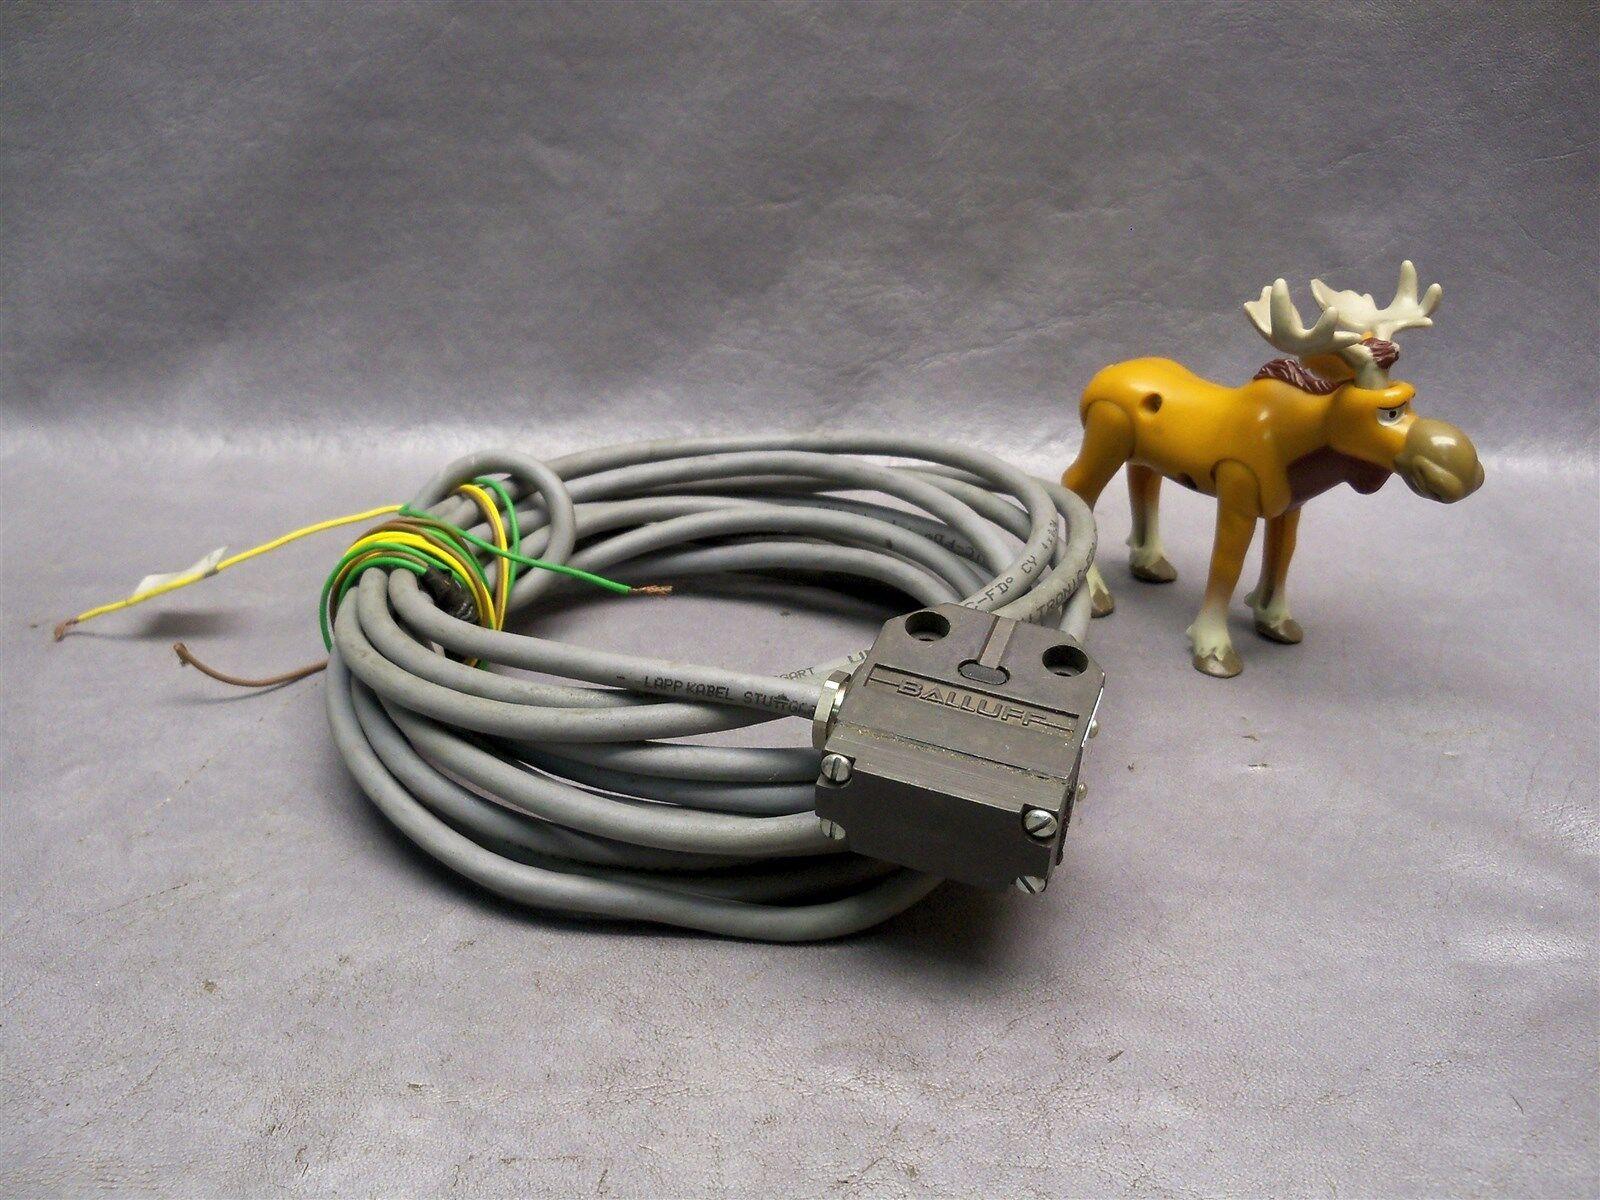 Balluff 9907 BNS 519-x496-99-r-11 Limit Switch With 16 Foot Wire | eBay